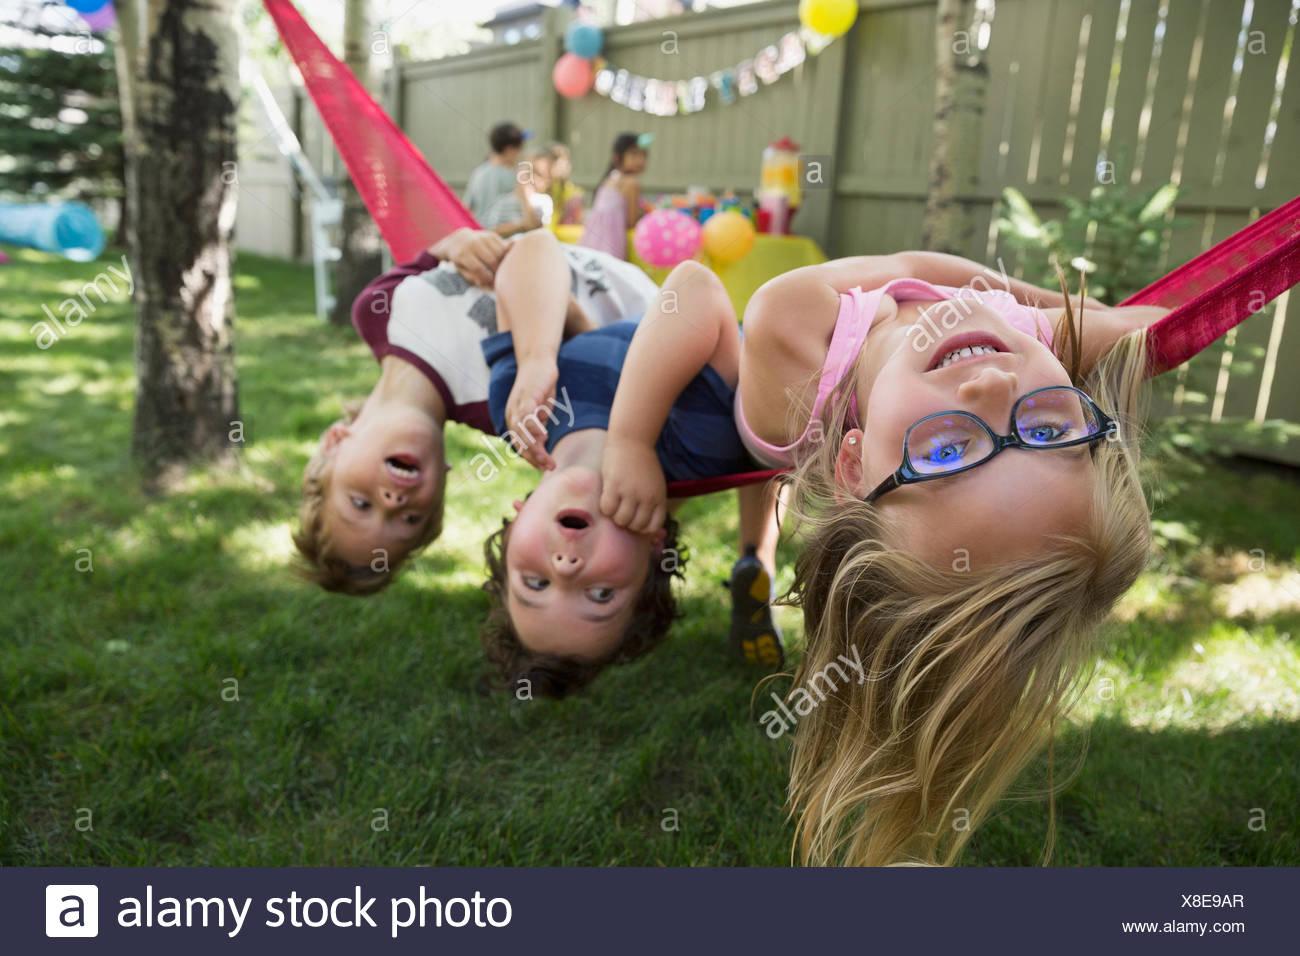 Portrait upside-down kids hammock backyard birthday party - Stock Image